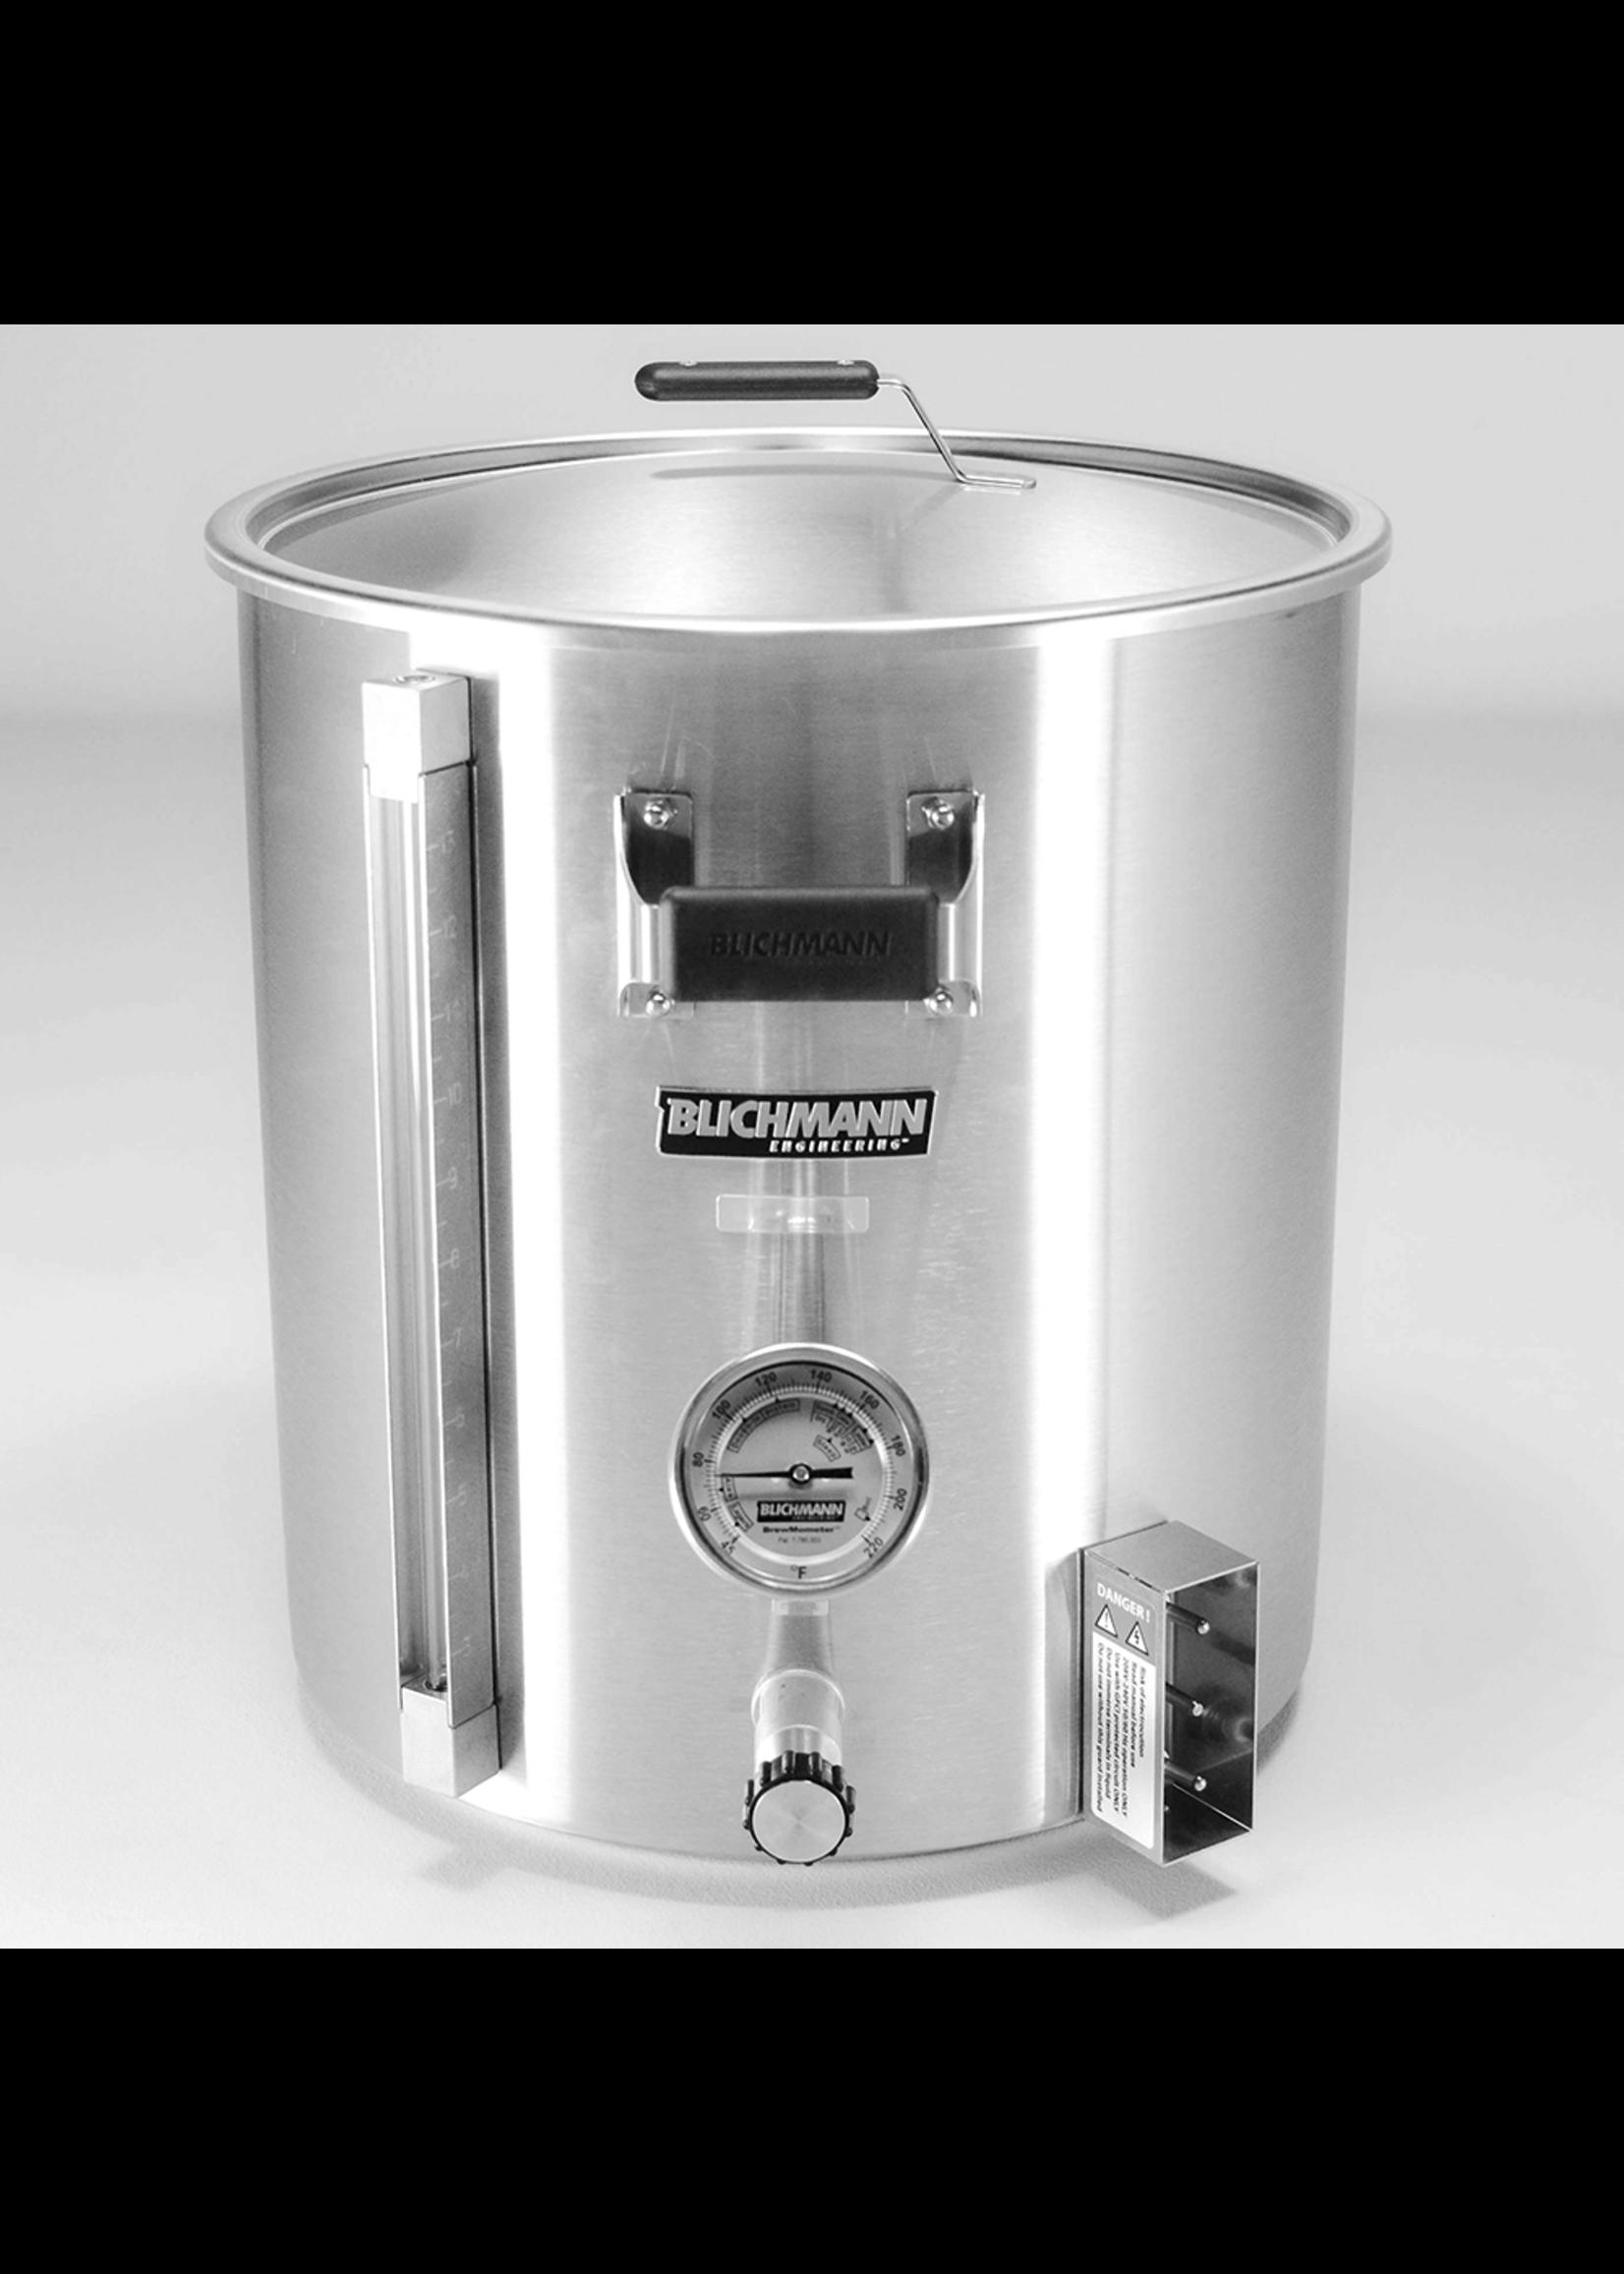 Blichmann Blichmann BoilerMaker G2 - 15 Gallon 240V Electric Brew Kettle (Celsius)